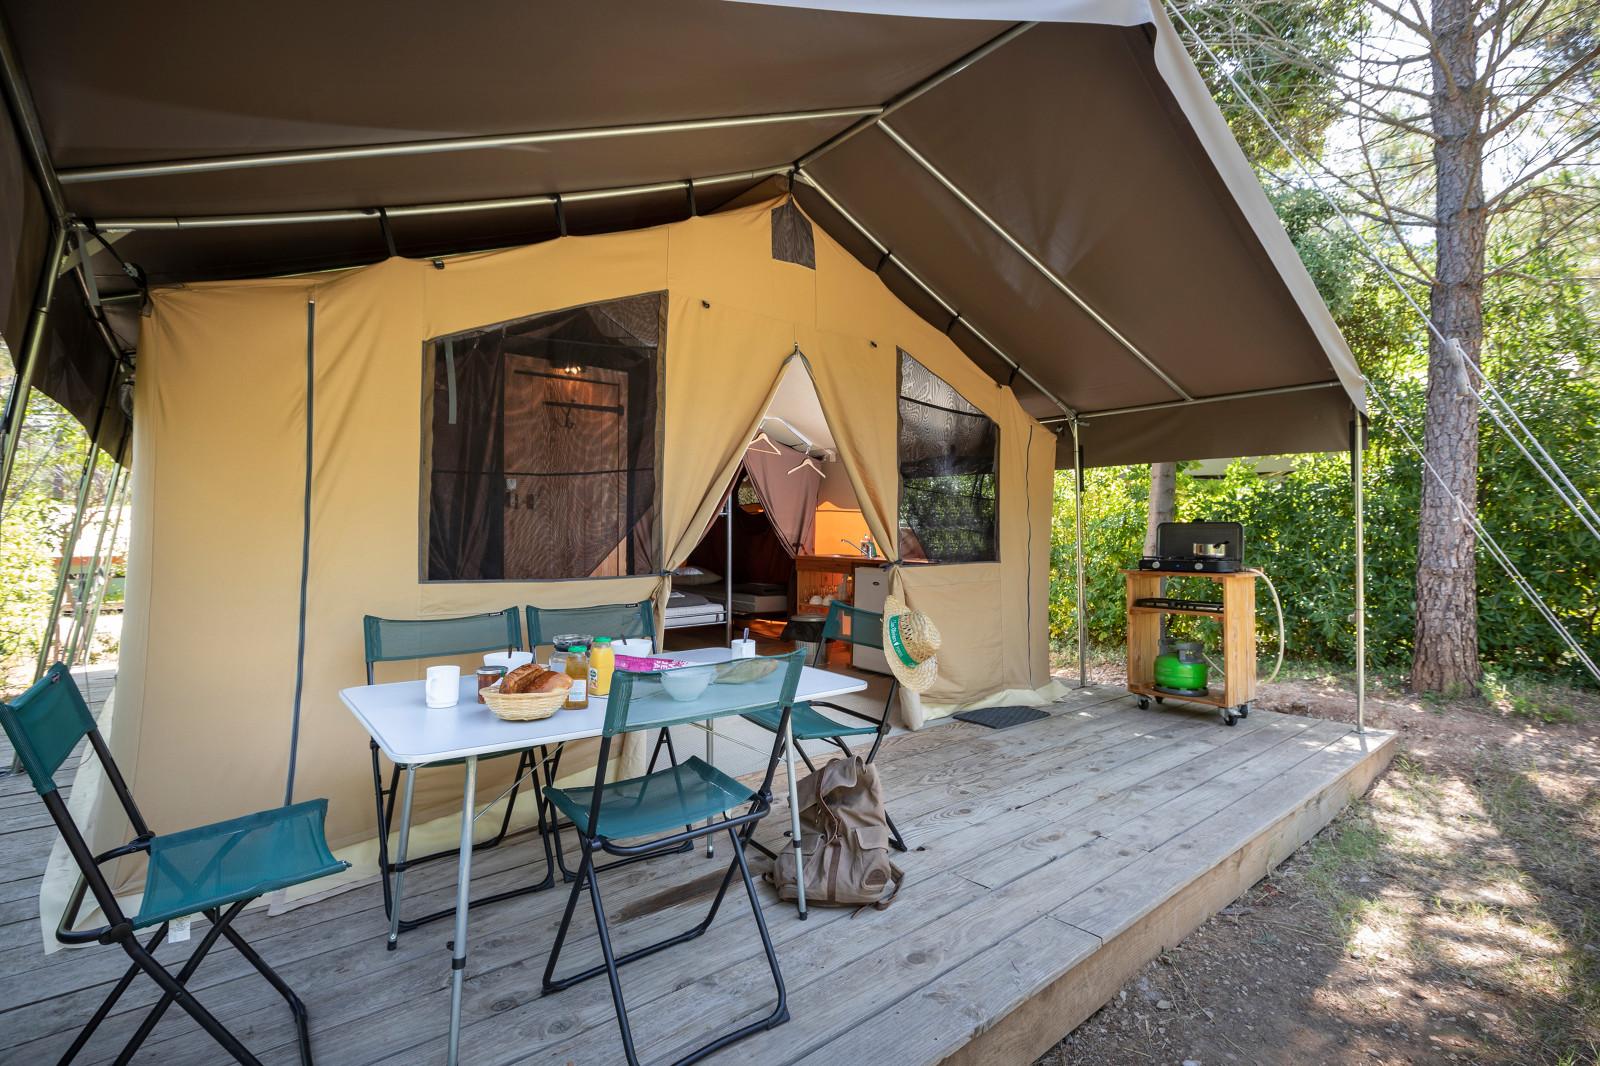 Camping Huttopia Fontvieille, Fontvieille, Bouches-du-Rhône